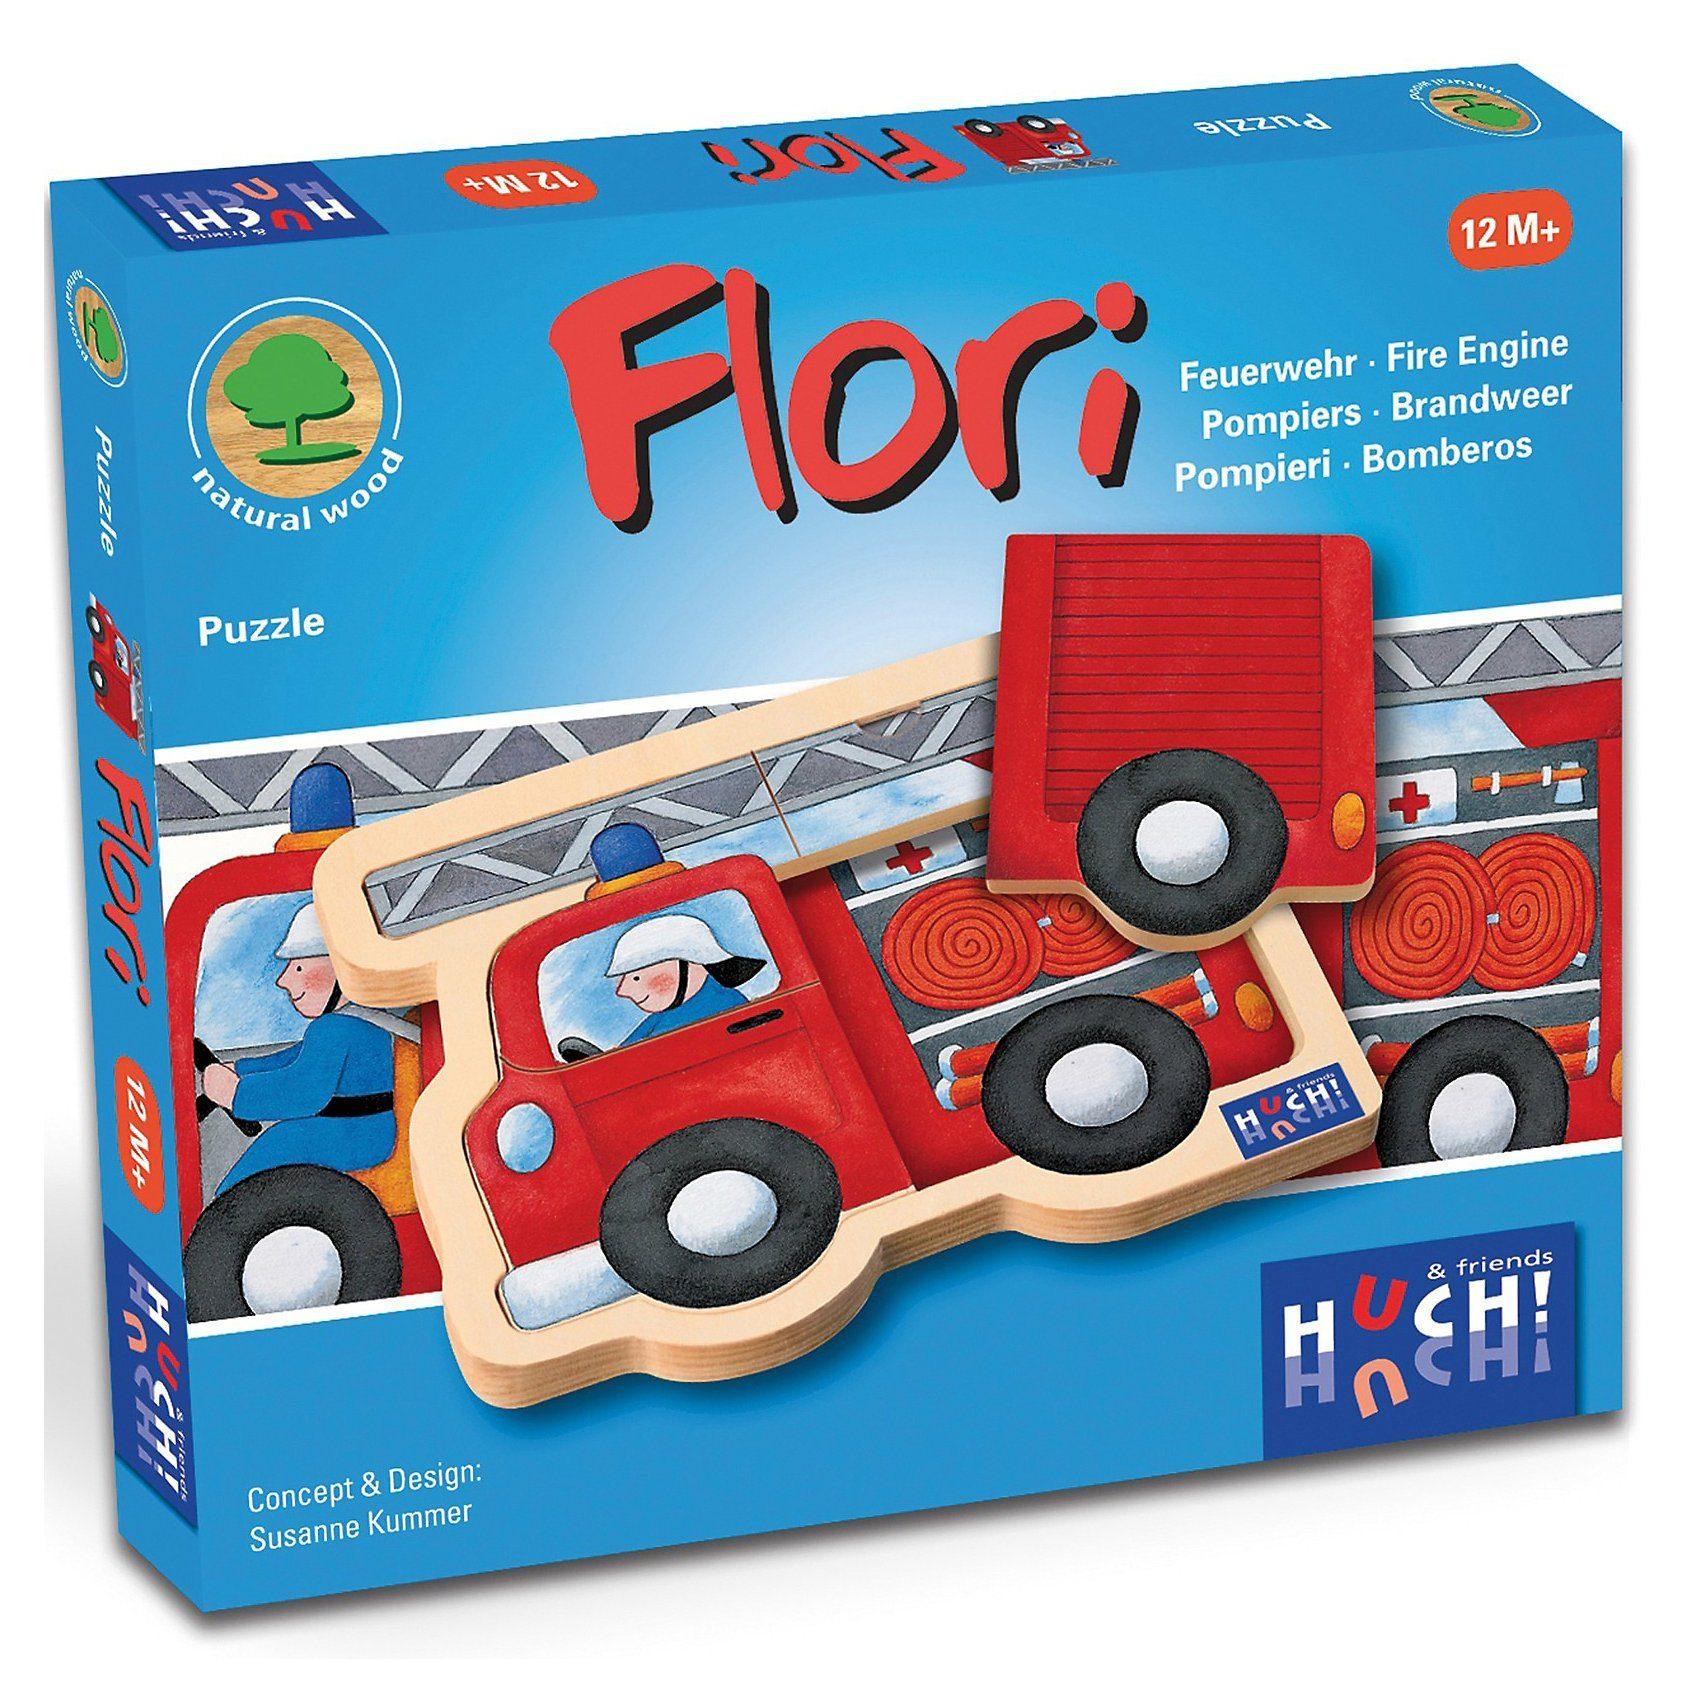 HUCH! Holzpuzzle Feuerwehrauto Flori 4 Teile